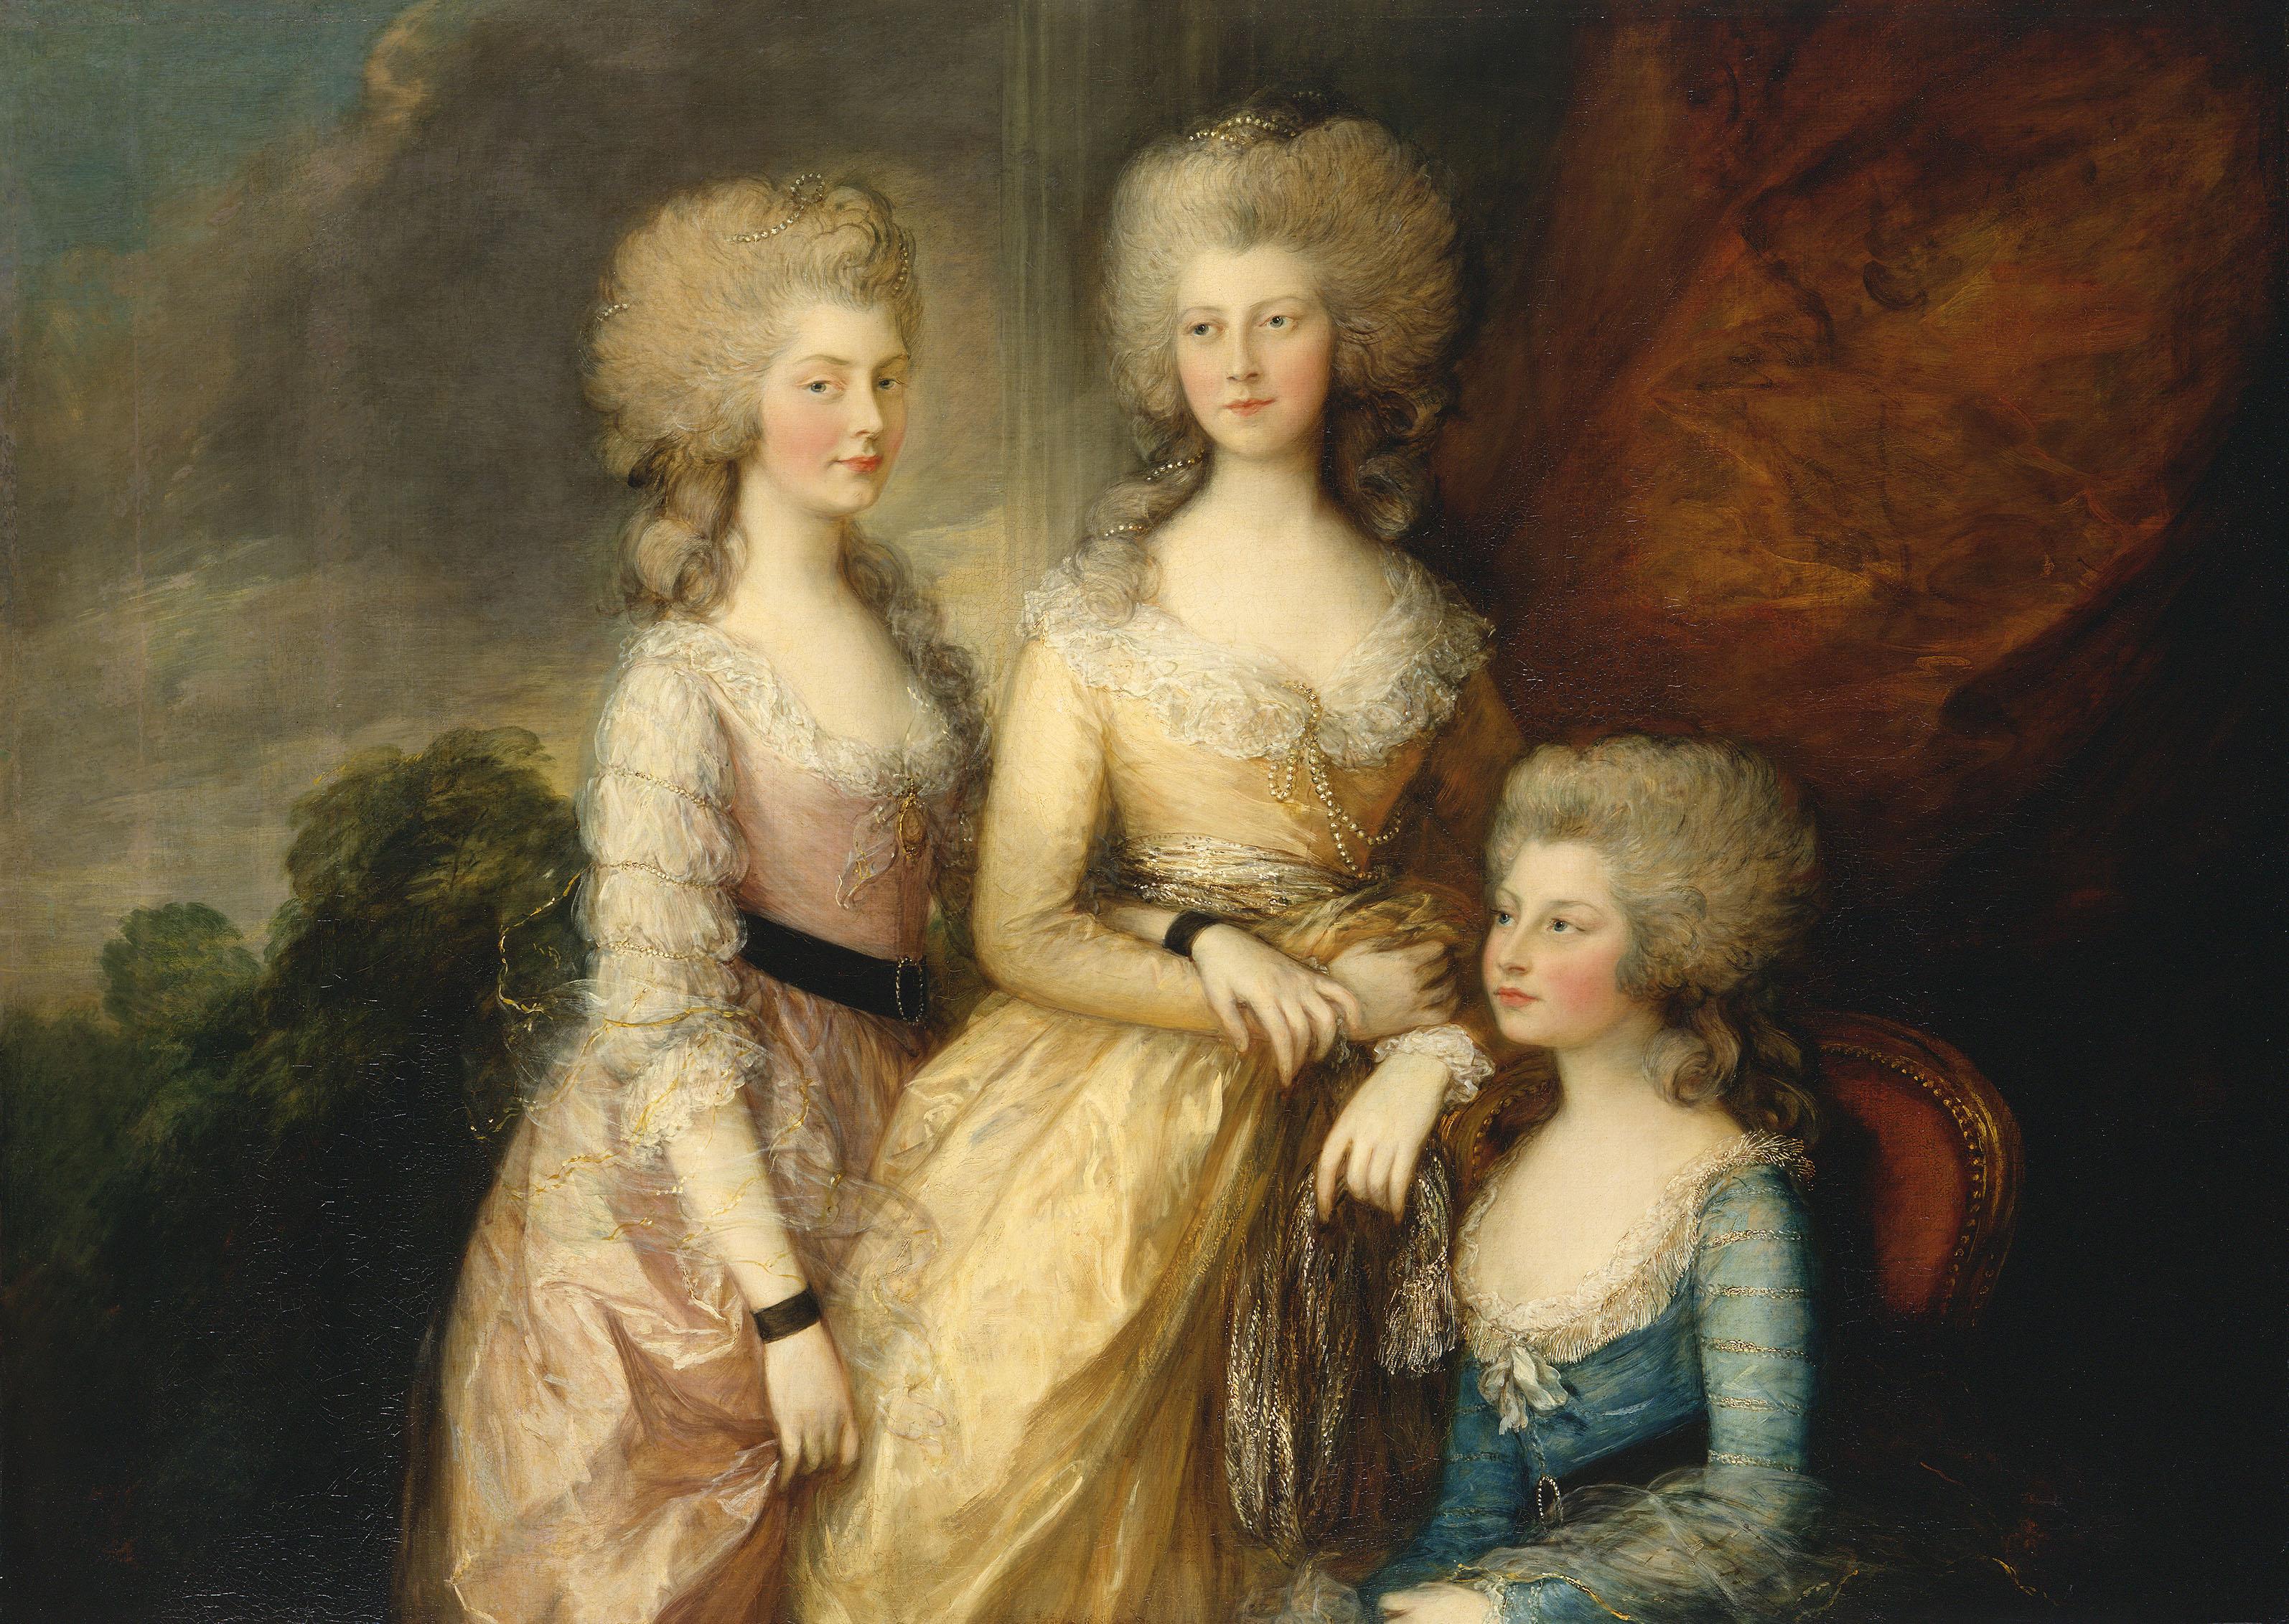 Thomas Gainsborough, The Three Eldest Princesses: Charlotte, Princess Royal, Augusta and Elizabeth, 1783-84